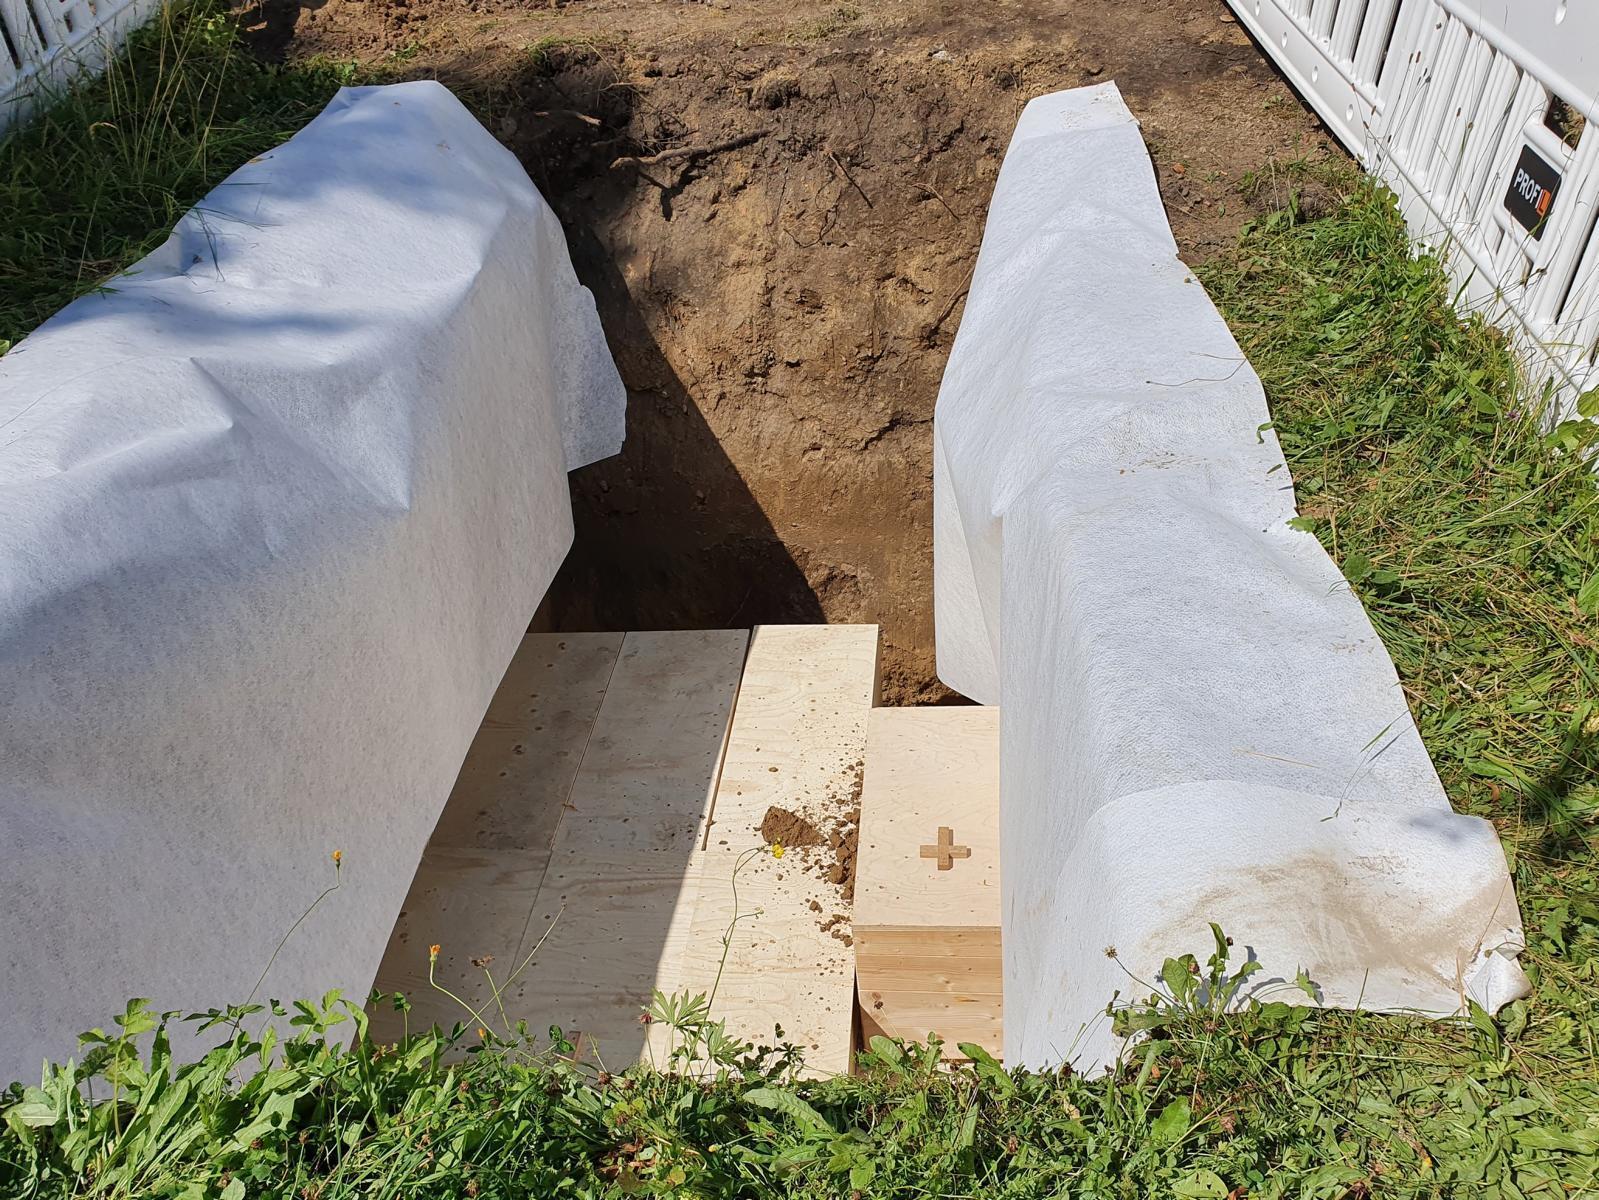 Juli20 beerdigung gebeine3